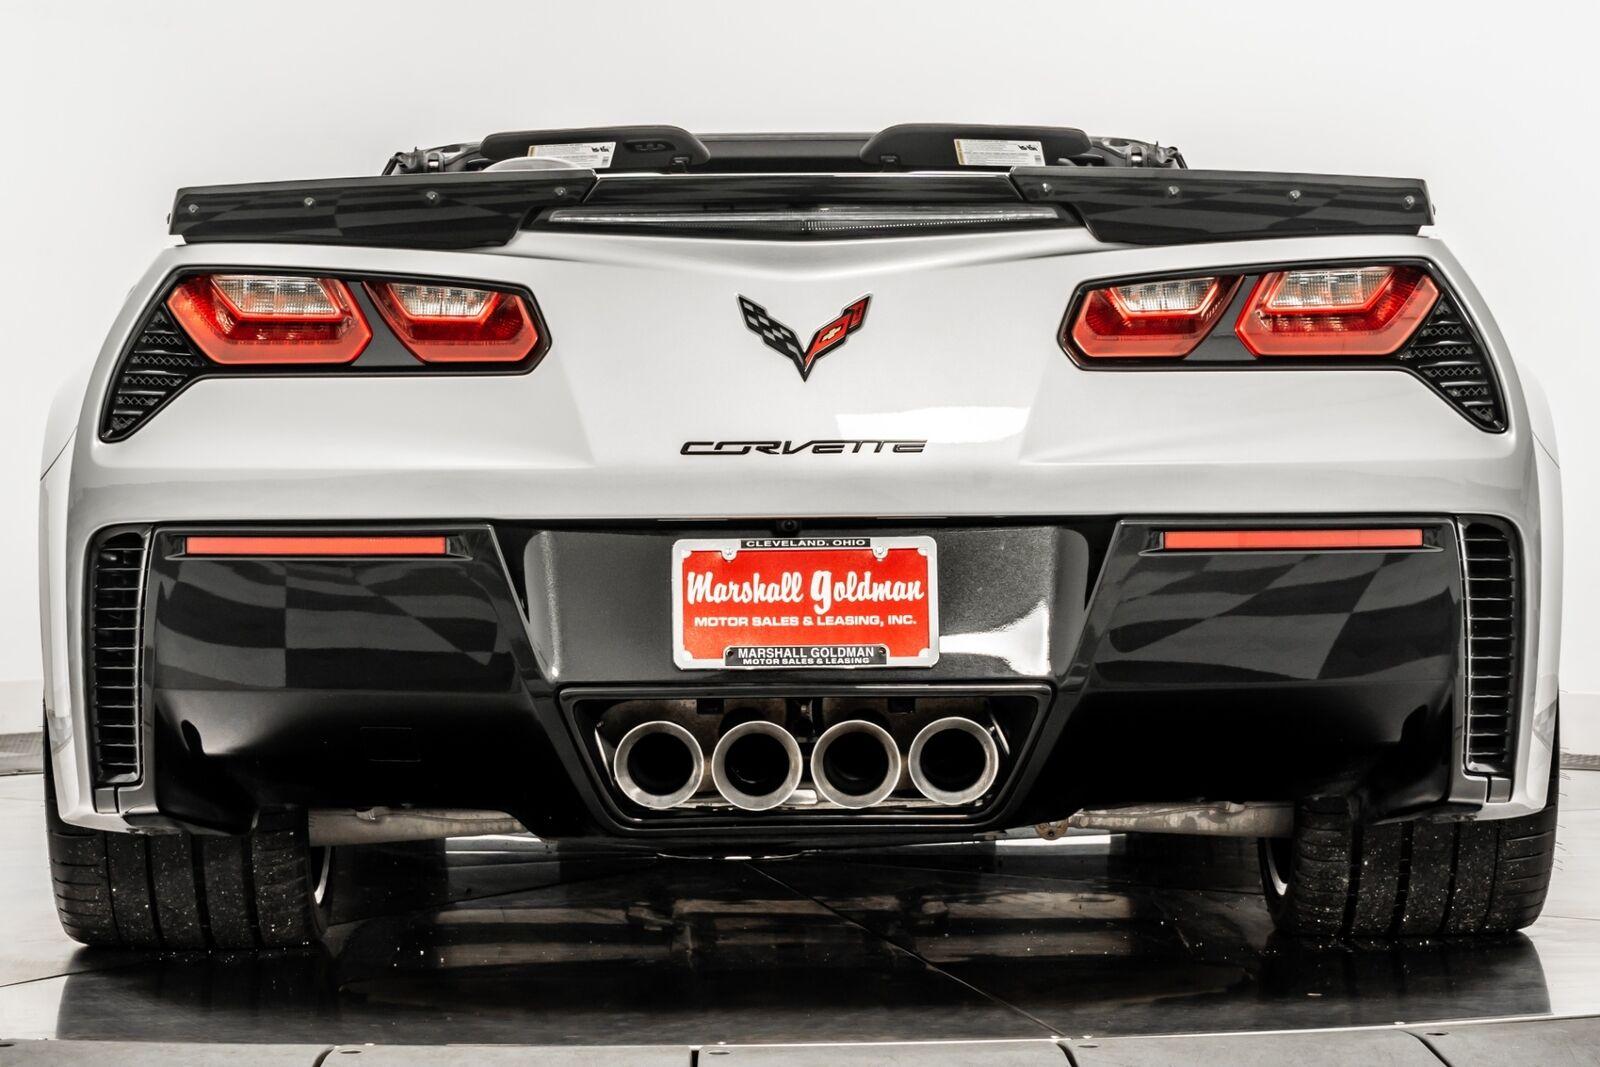 2019 Silver Chevrolet Corvette Grand Sport 2LT | C7 Corvette Photo 7